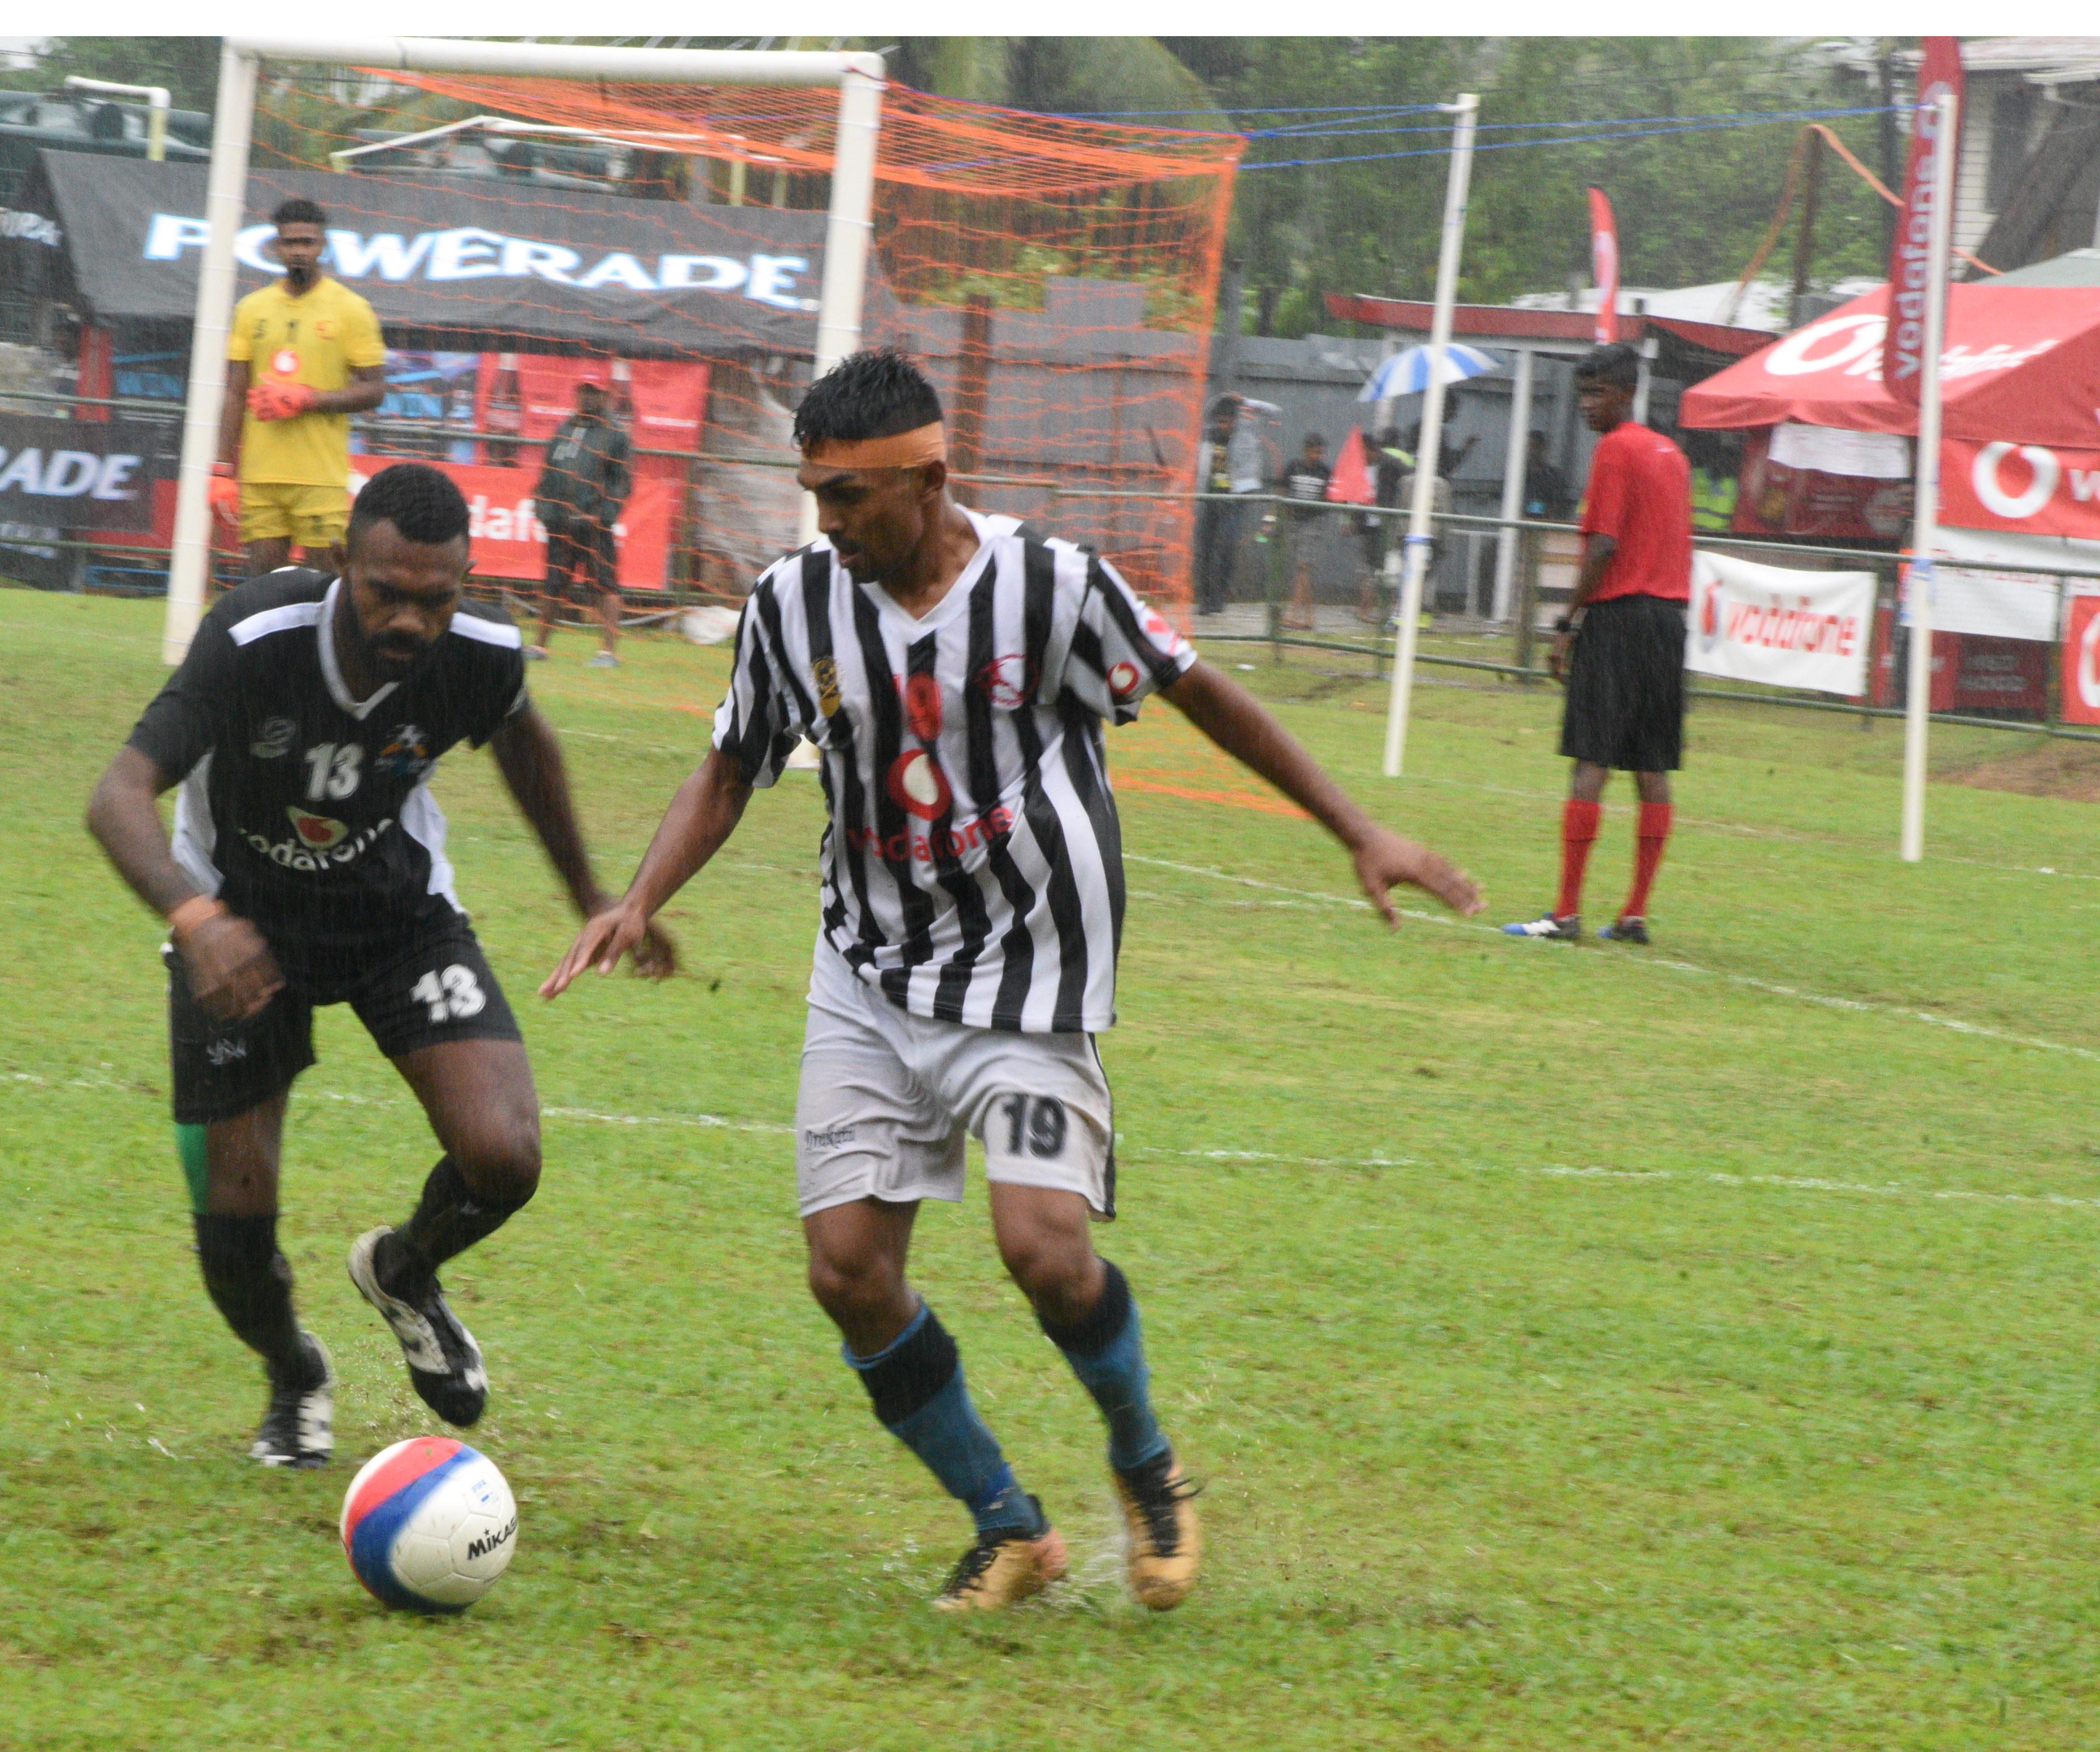 Mohammed Yaseen of Dreketi shields the ball away from Malakai of Ba during the Vodafone Fiji FACT at Ratu Cakobau Park, Nausori on May 27, 2018.  Photo: Simione Haravanua